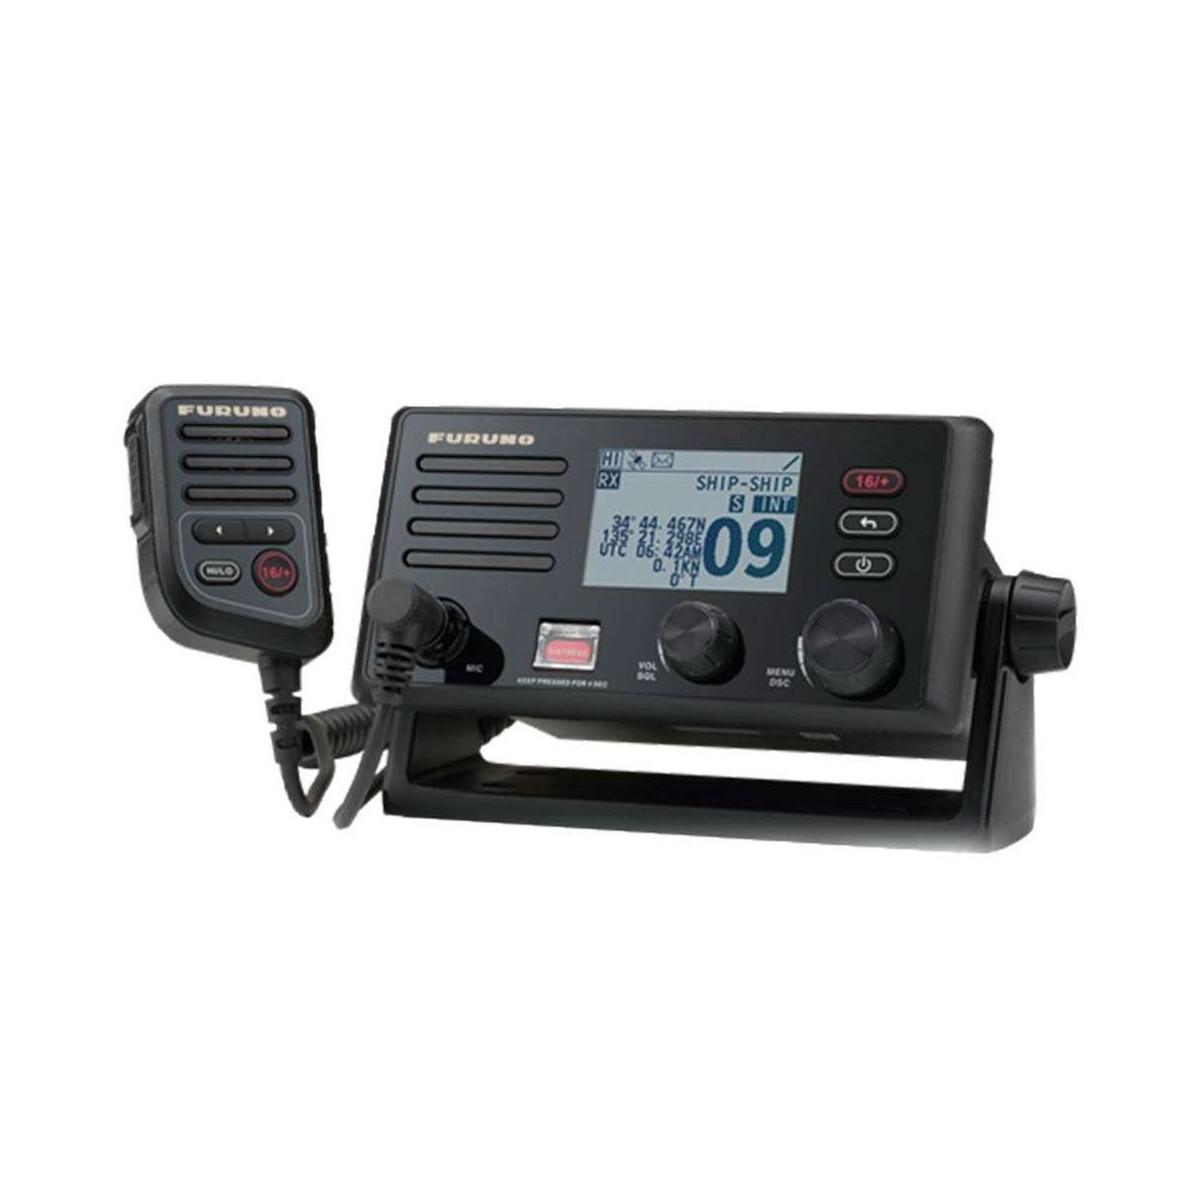 FM4800